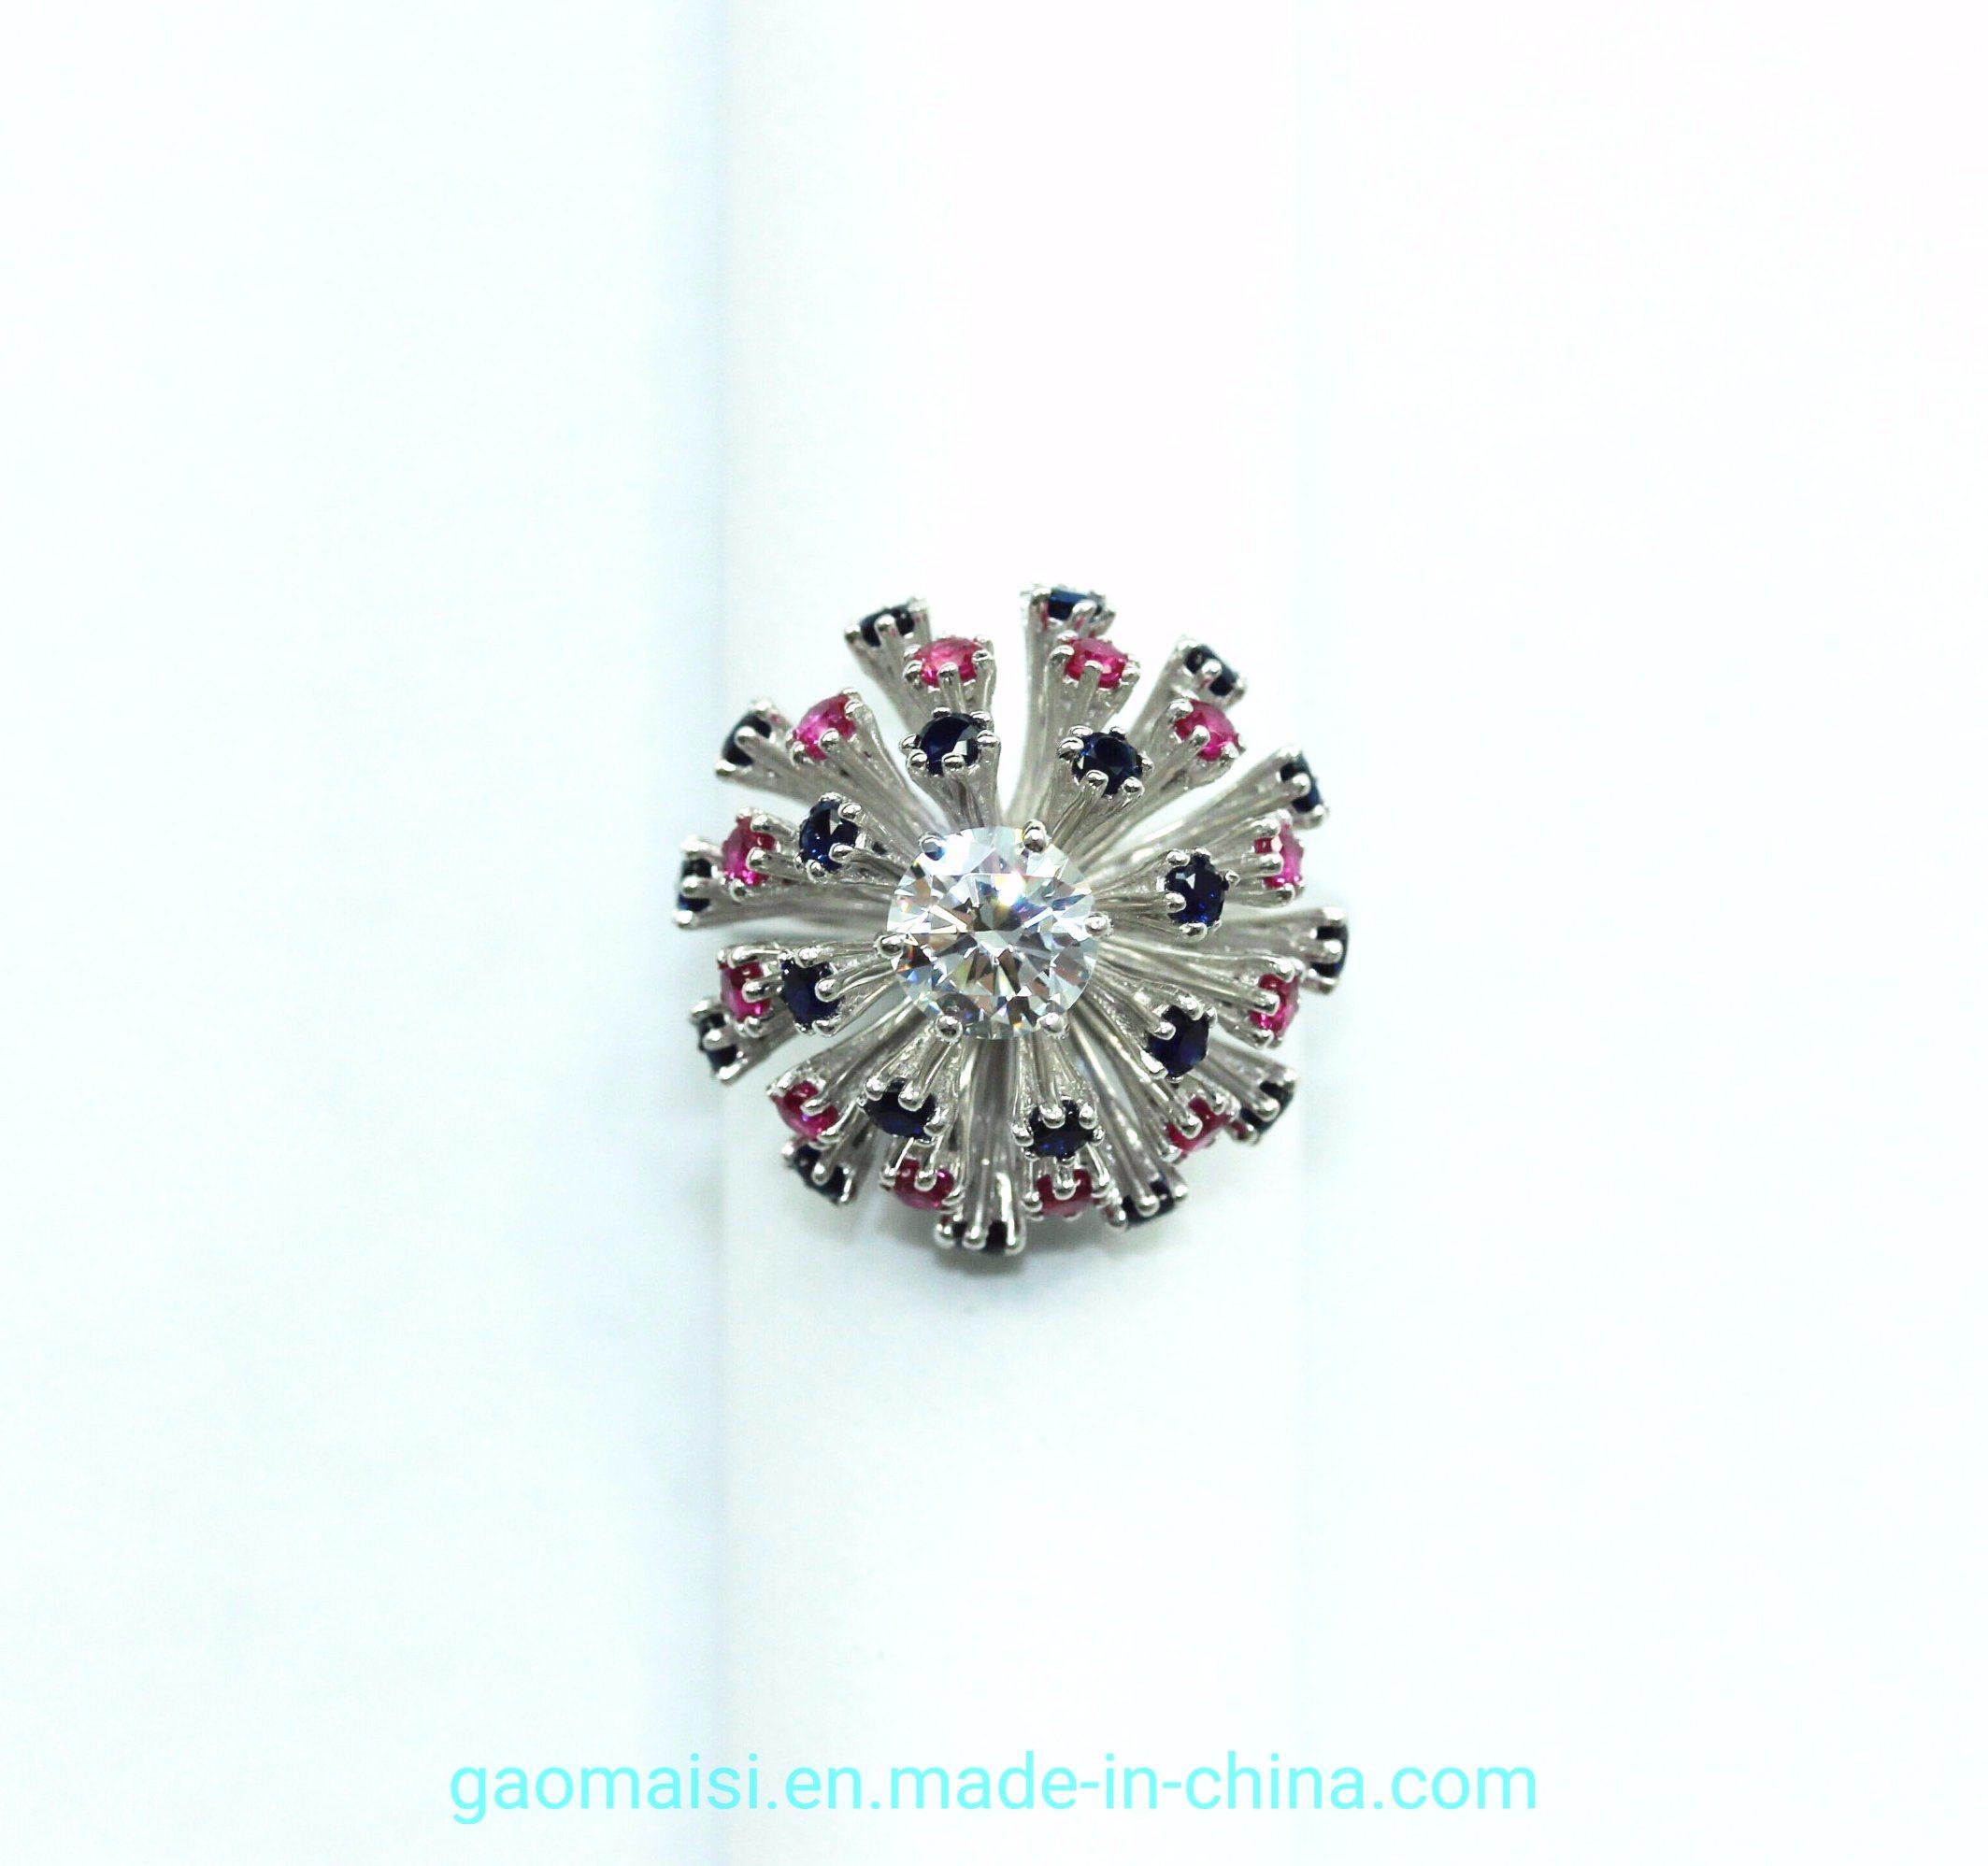 Flower ring 925 silver